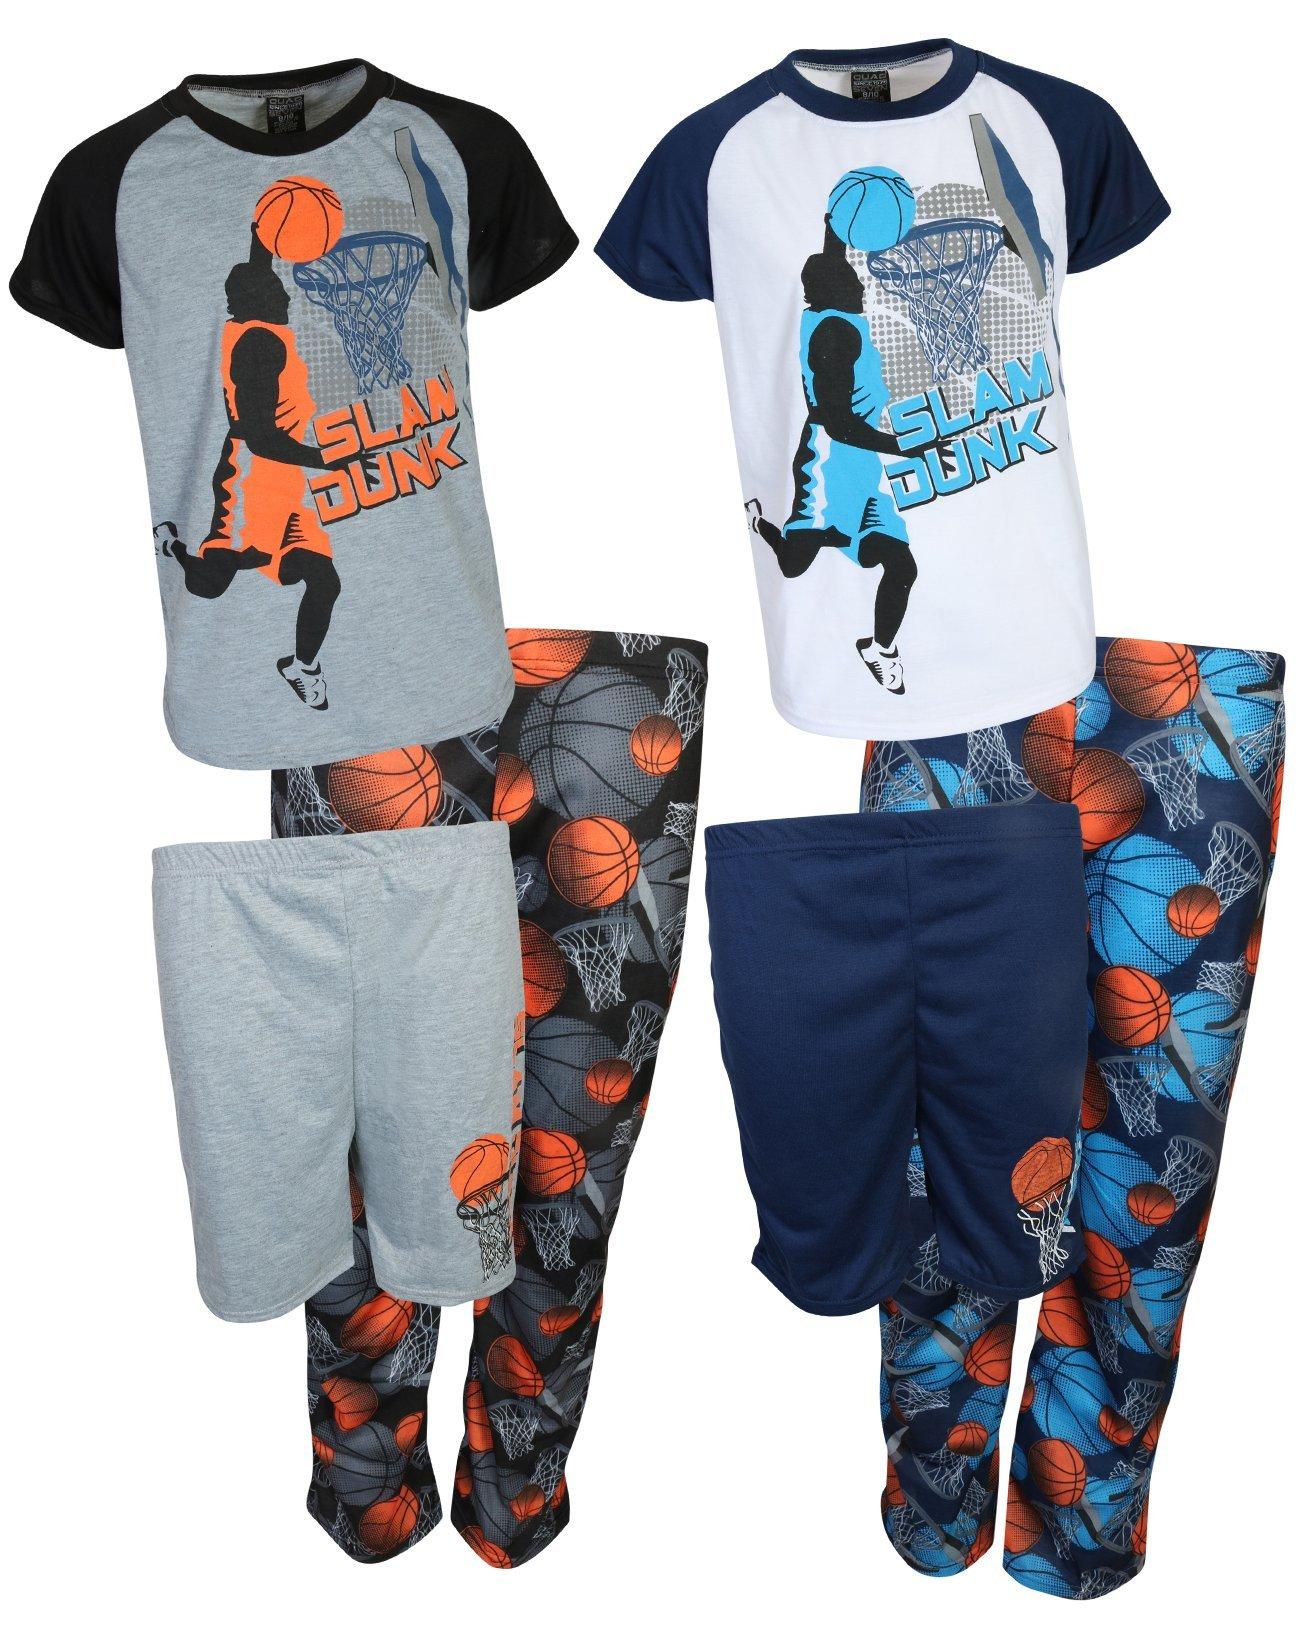 Quad Seven Boys 6 Piece Mix & Match Pajama Set (2 Tops, 2 Shorts and 2 Pants) Slam Dunk, Size 16/18'